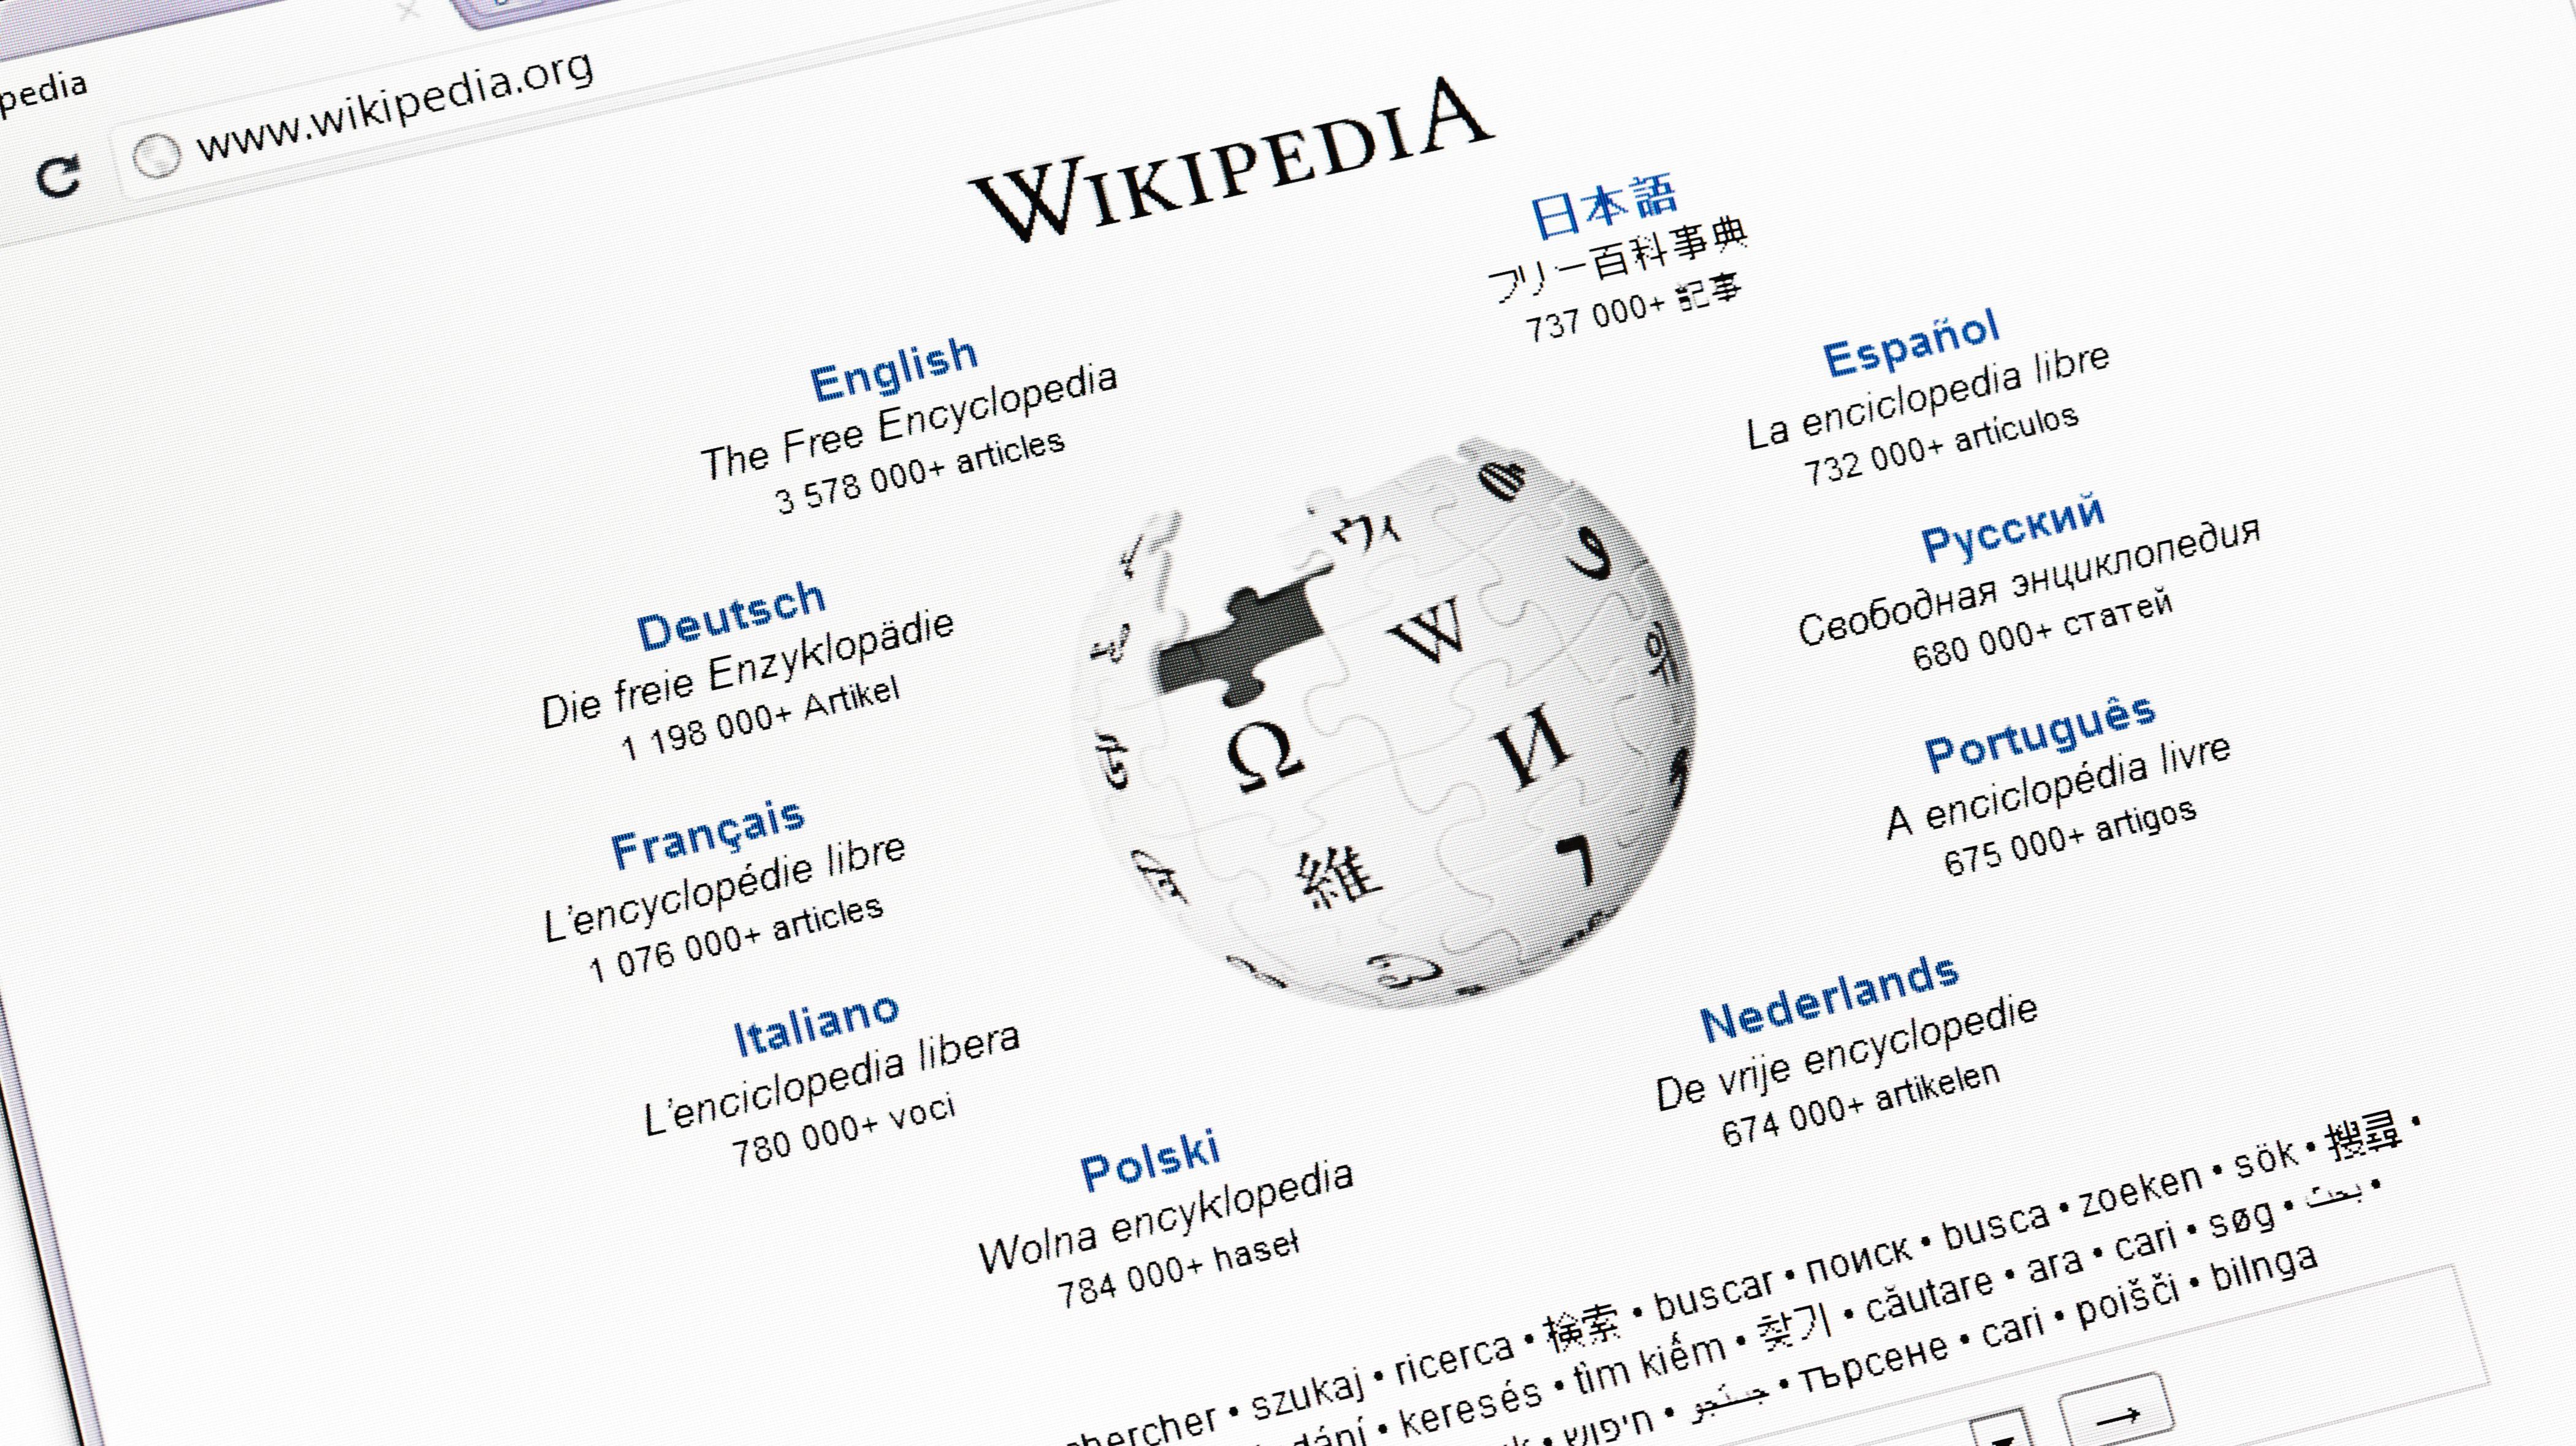 Steven Pruitt, Wikipedia's Unofficial King, Has Shaped a